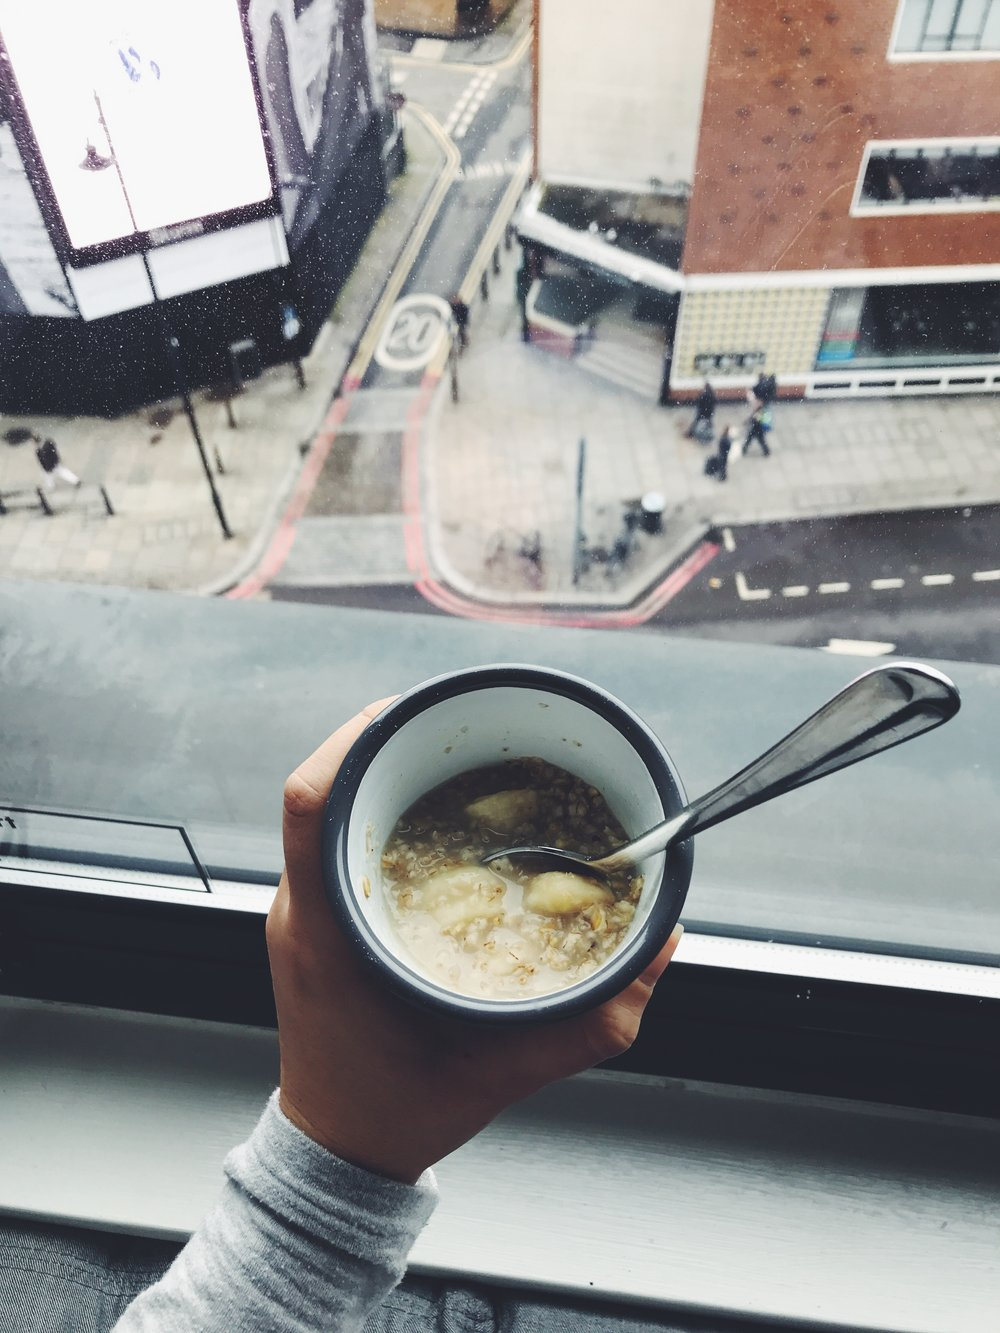 banana oatmeal healthy tips while traveling